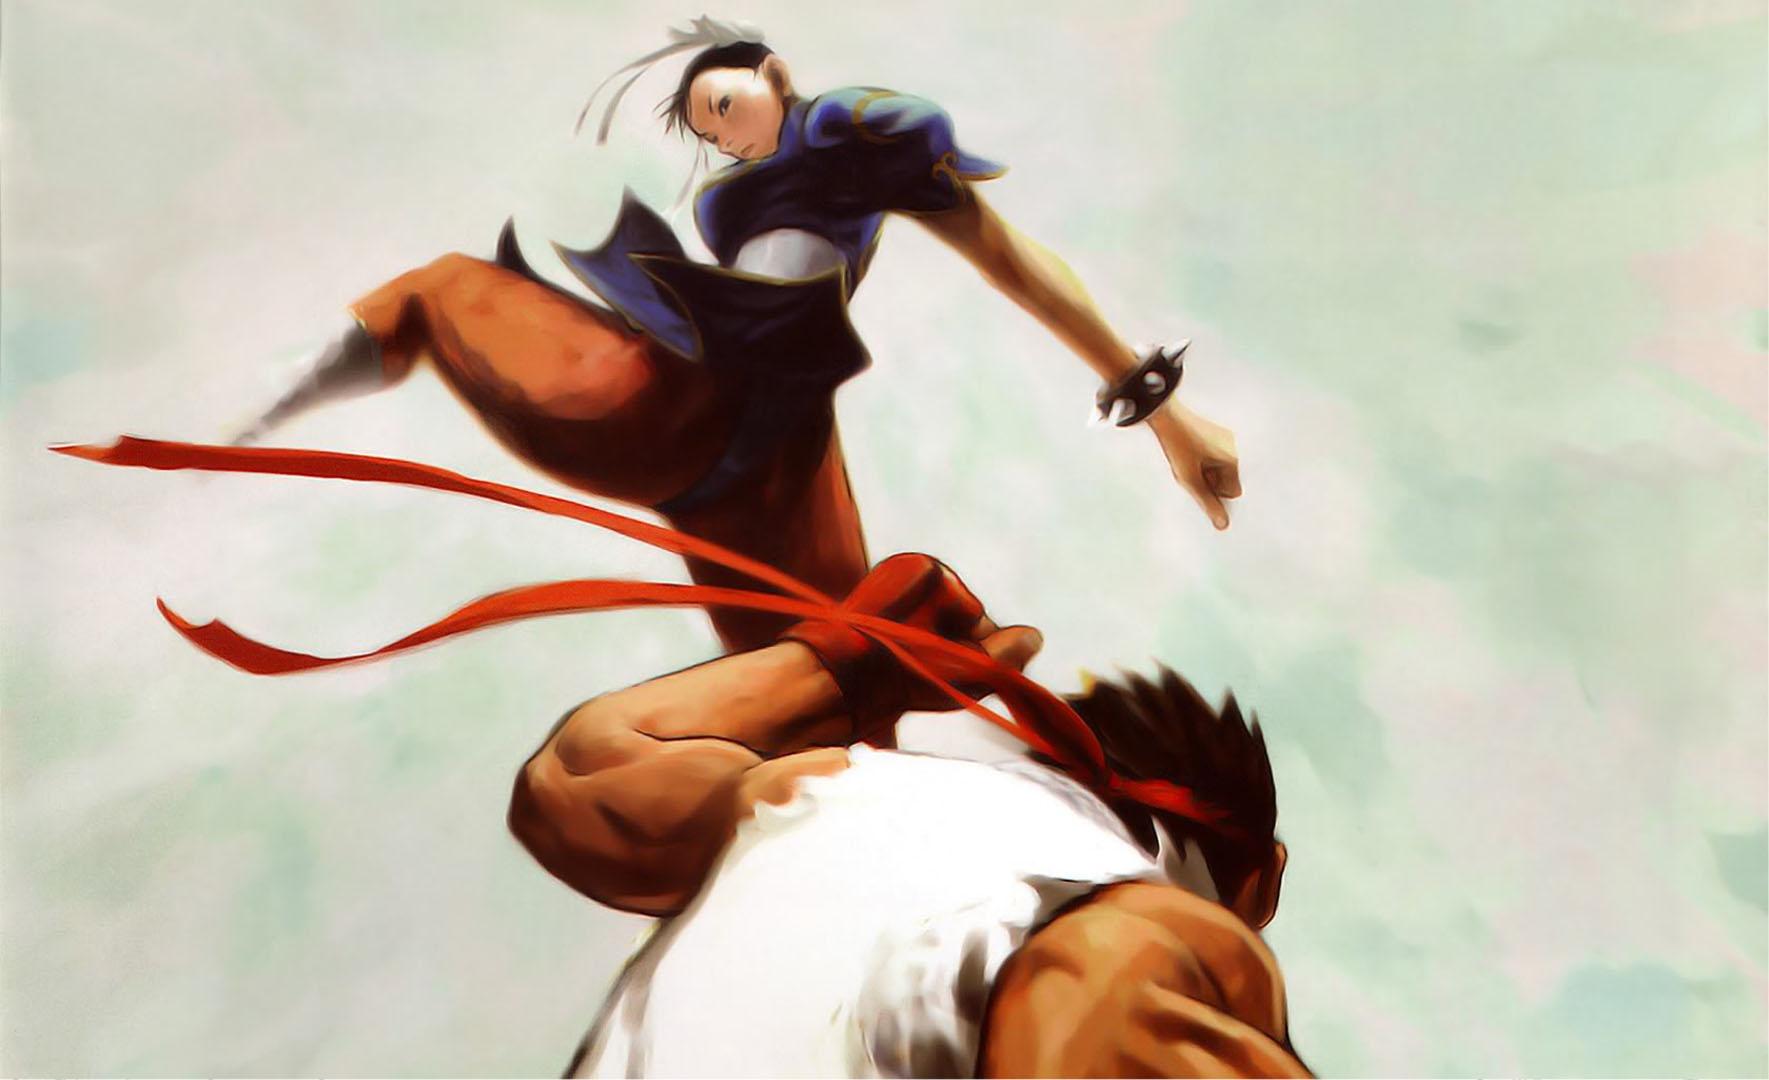 Chun Li Flying Kick Street Fighter 2 Wallpaper